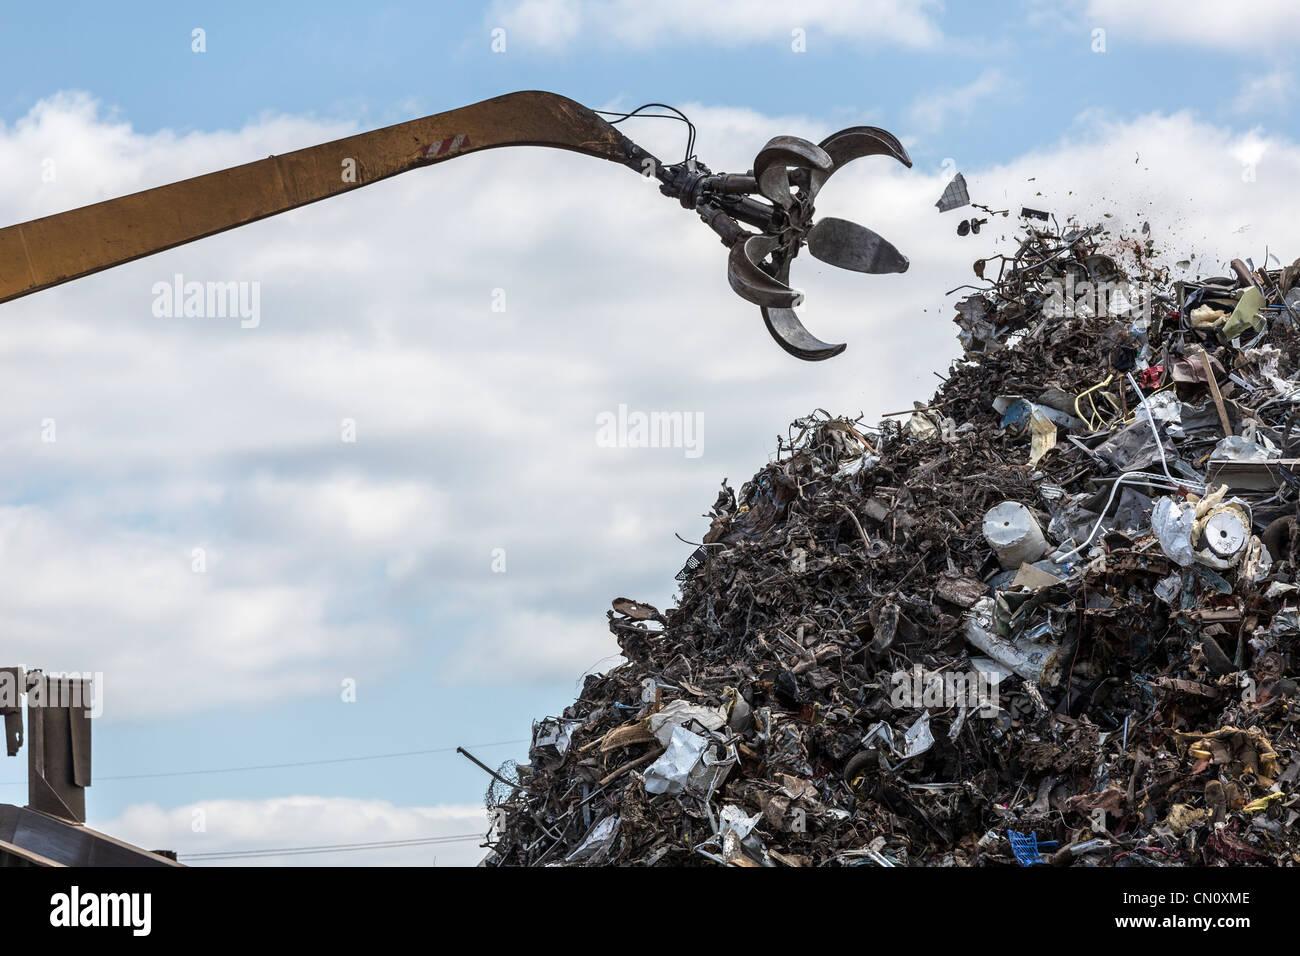 crane claw throwing rubbish, SPC corporation INC waste recycling plant, Philadelphia, Pennsylvania, USA - Stock Image